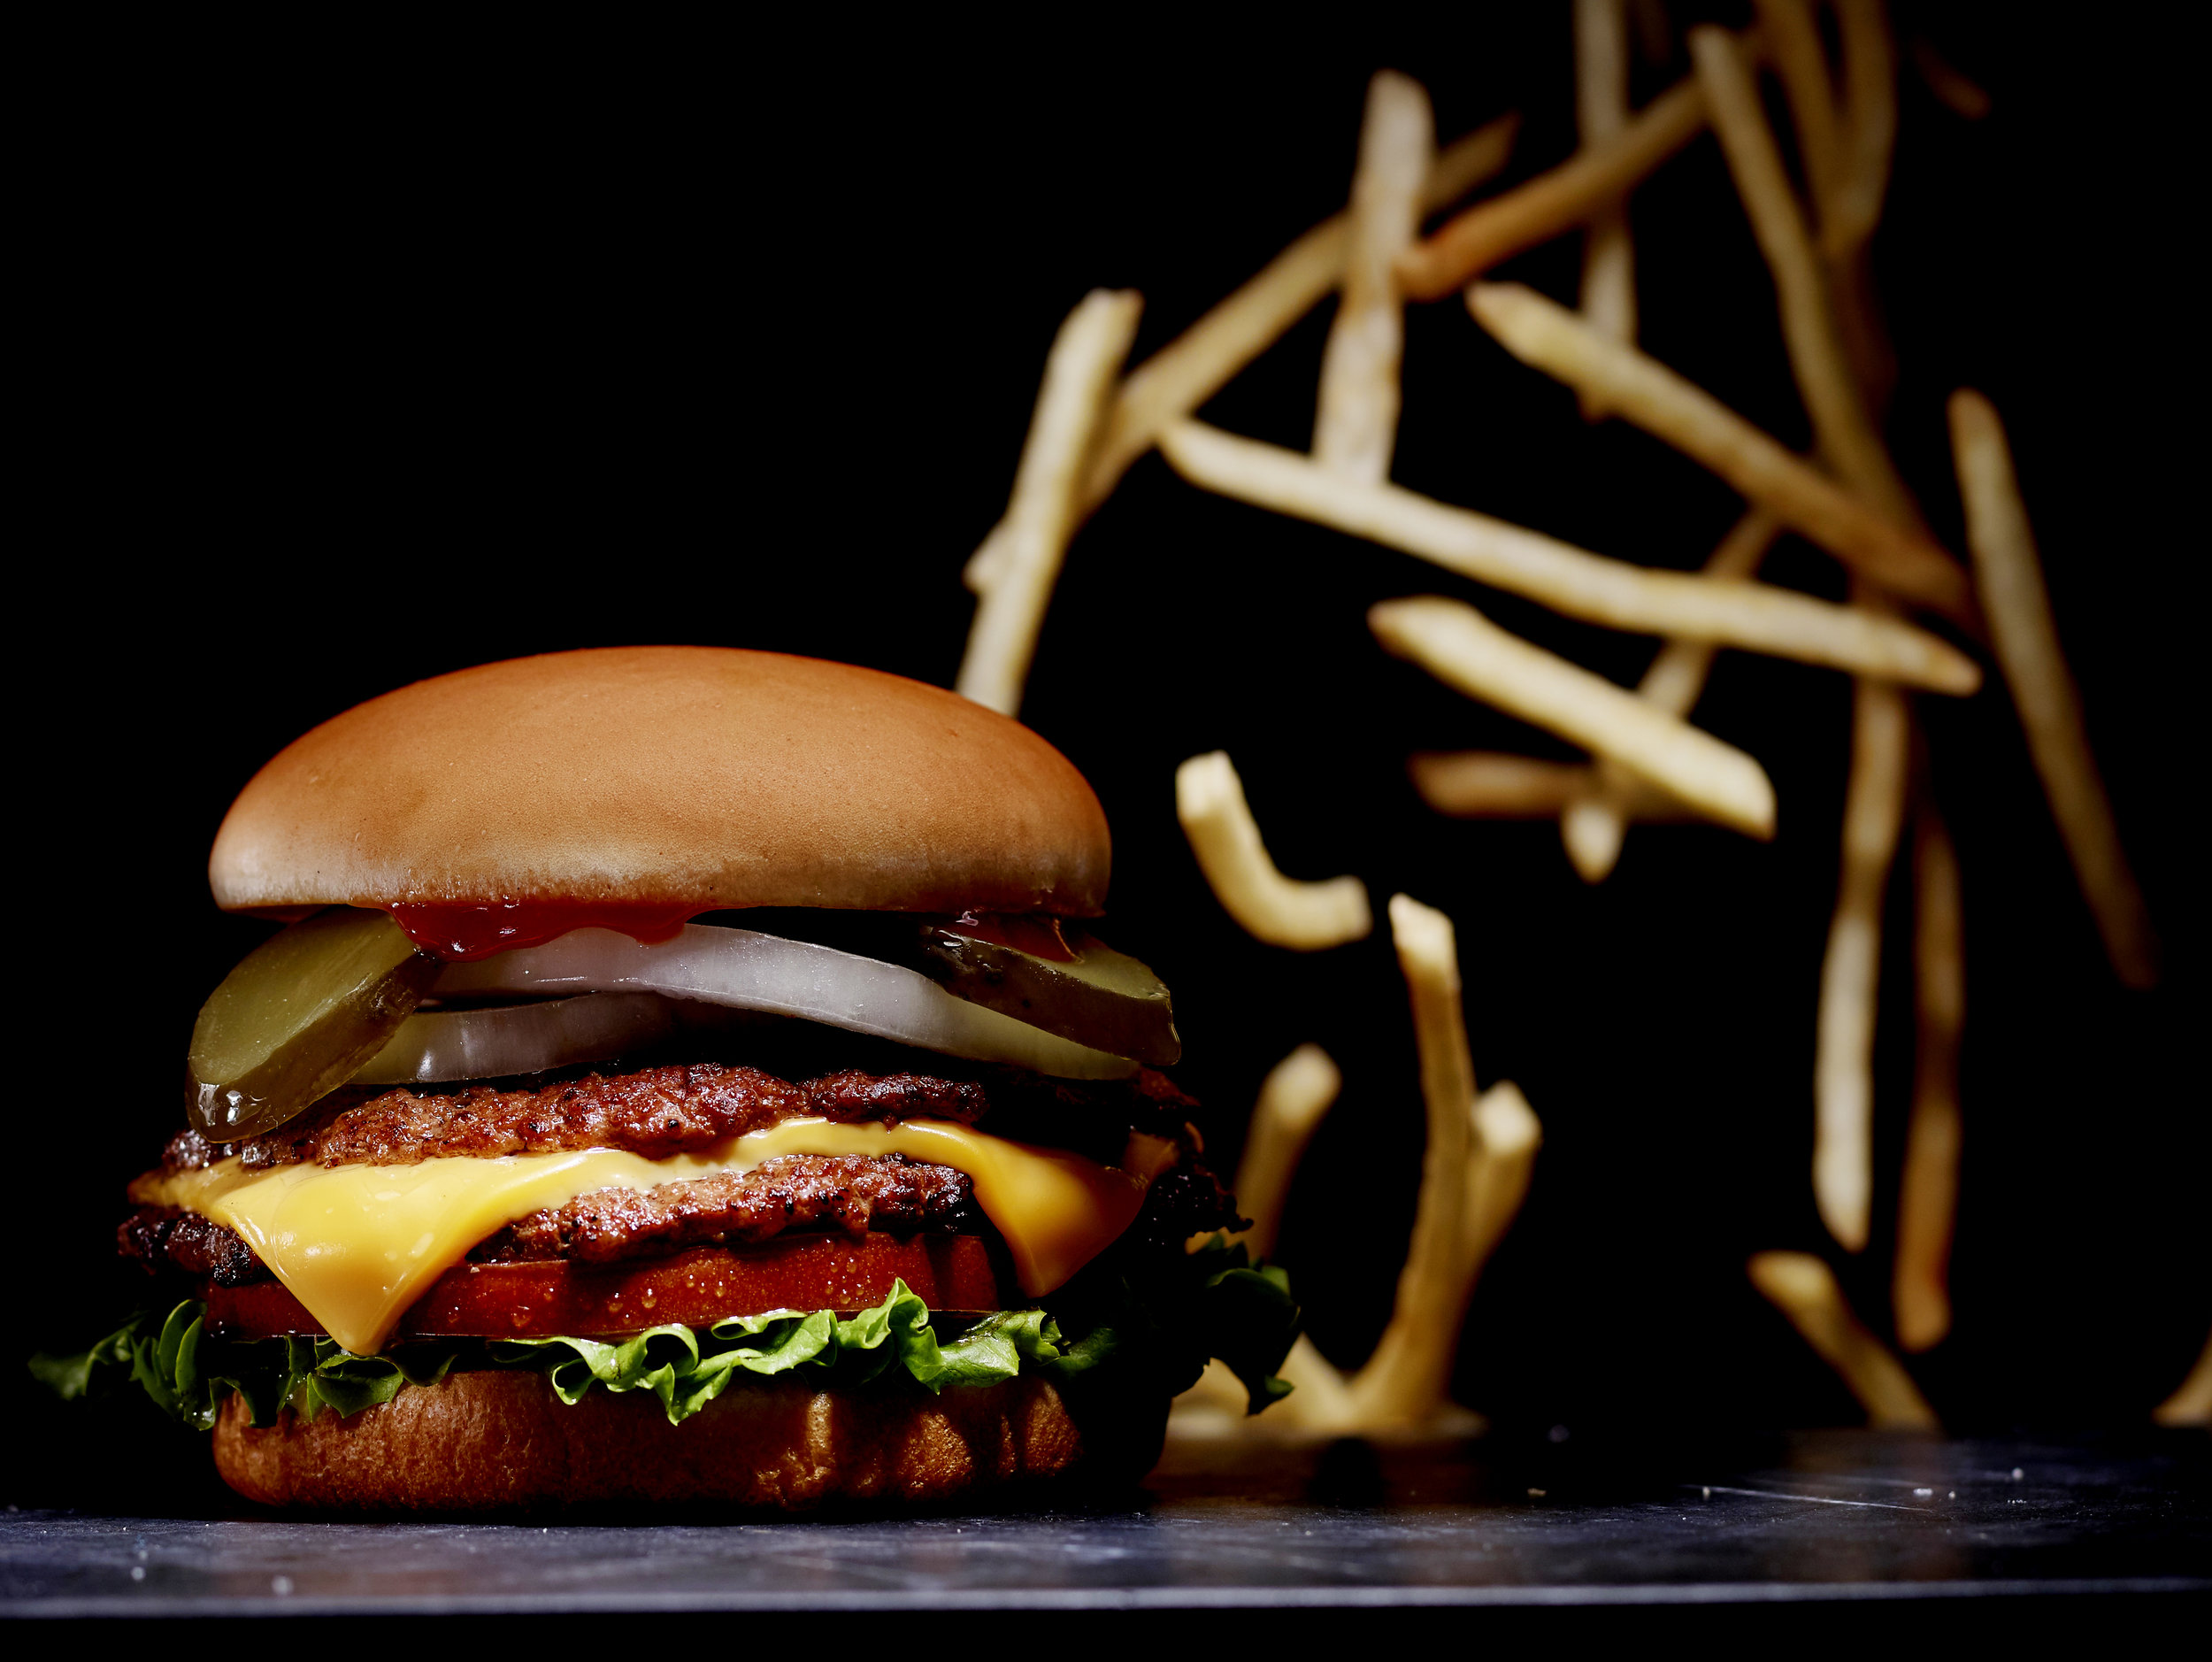 Dark_burger_falling_fries2.jpg